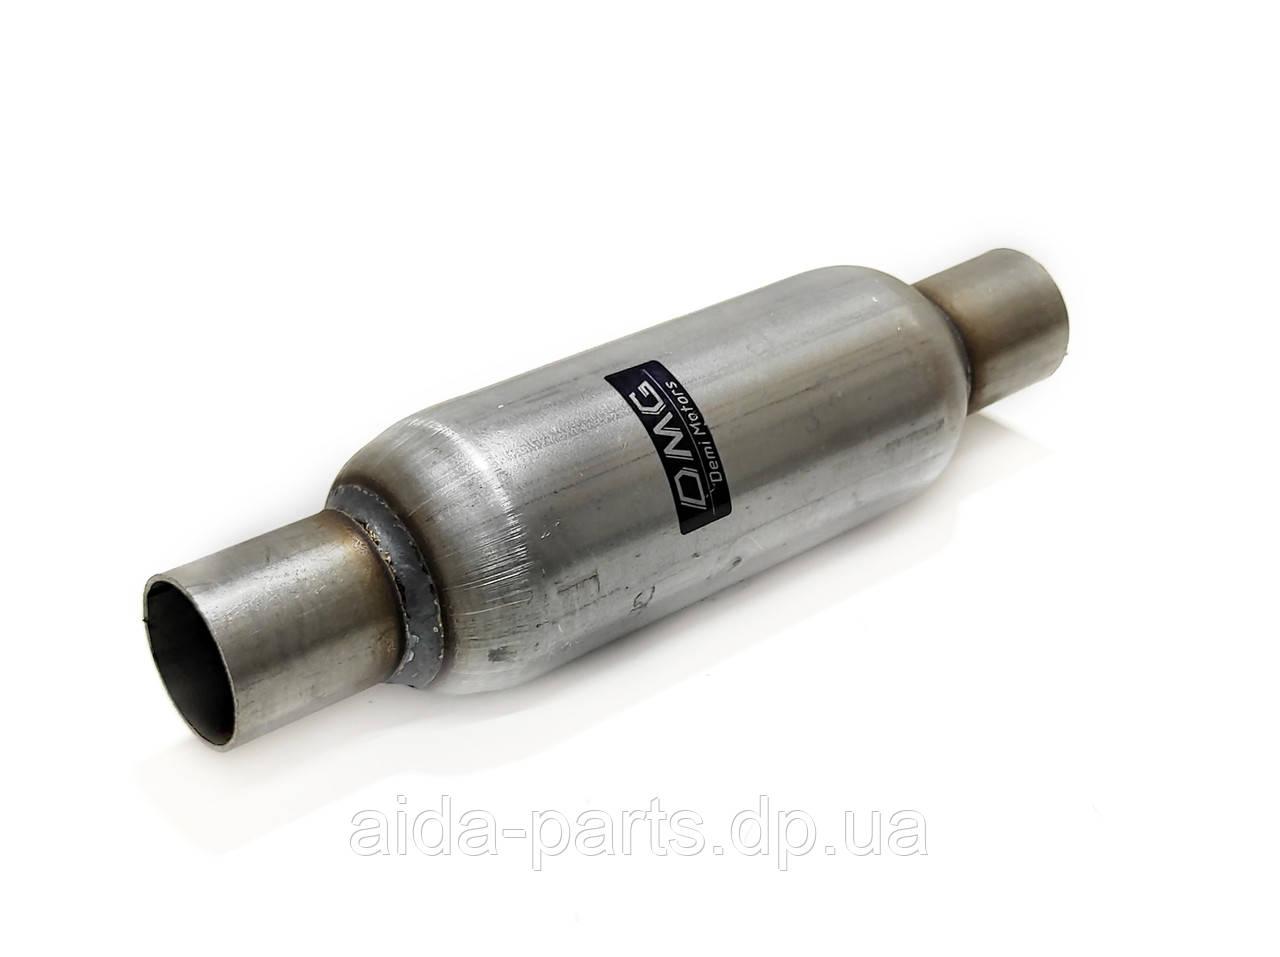 Стронгер (Х-резонатор-пламегаситель) -  55х300